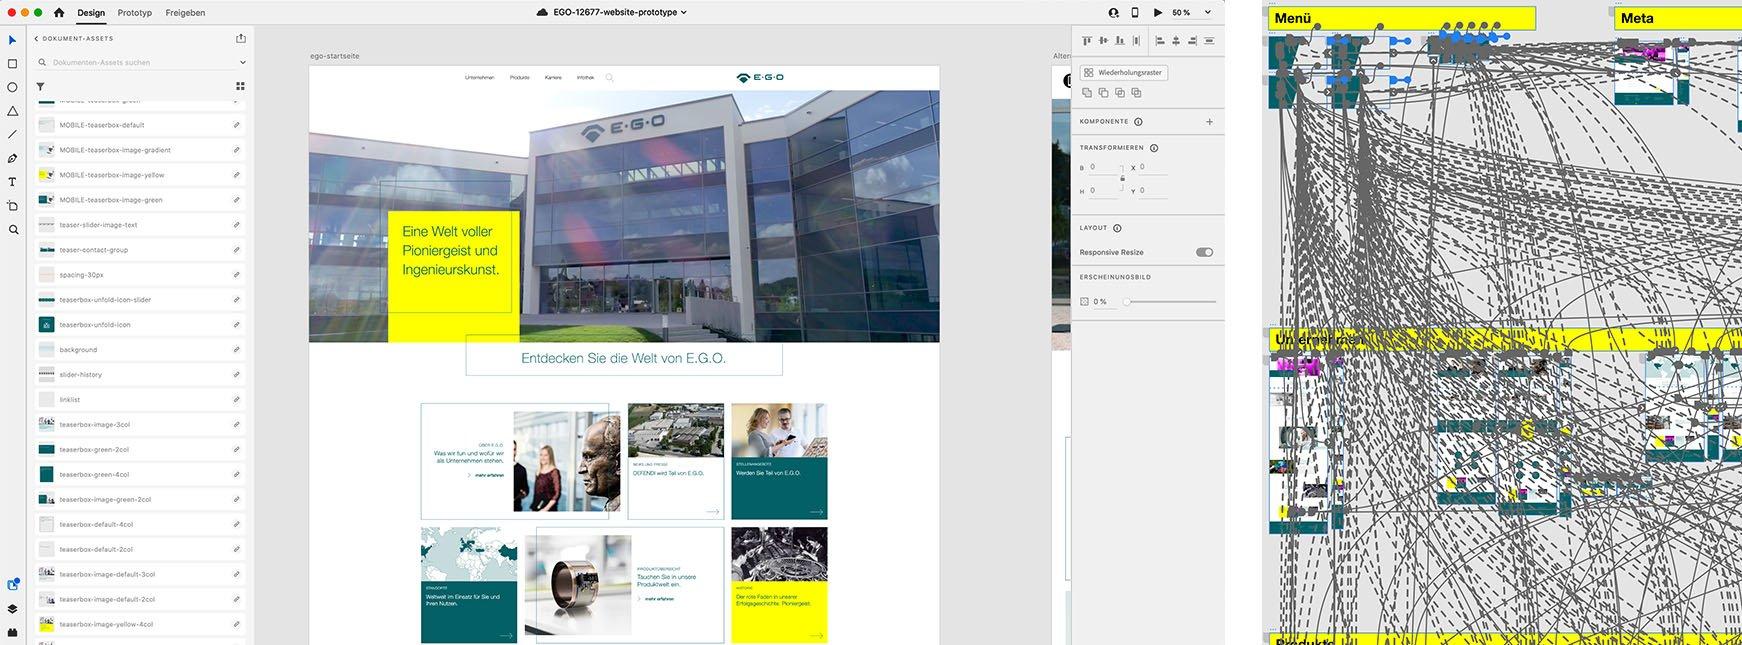 blogbeitrag-ego-adobe-xd-layout-2er-2